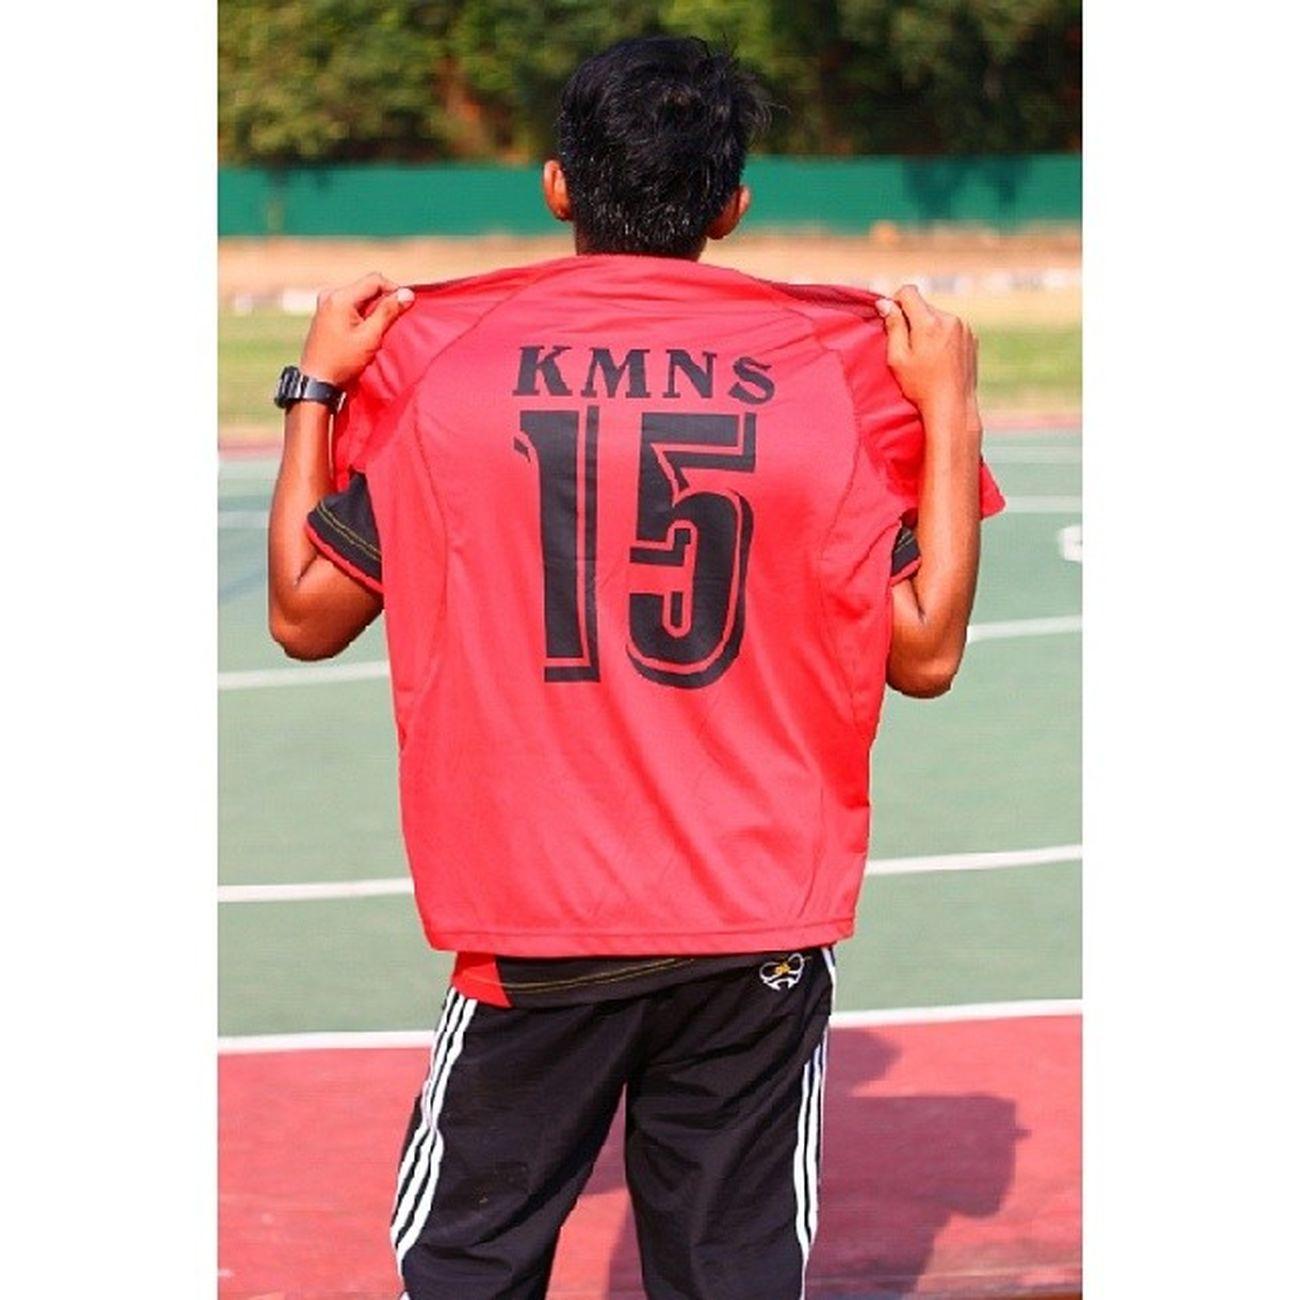 Habis juga akhirnya , ayuh ke Final kita.. Thanks no15 , semangatdijuang .. Kmns Johan